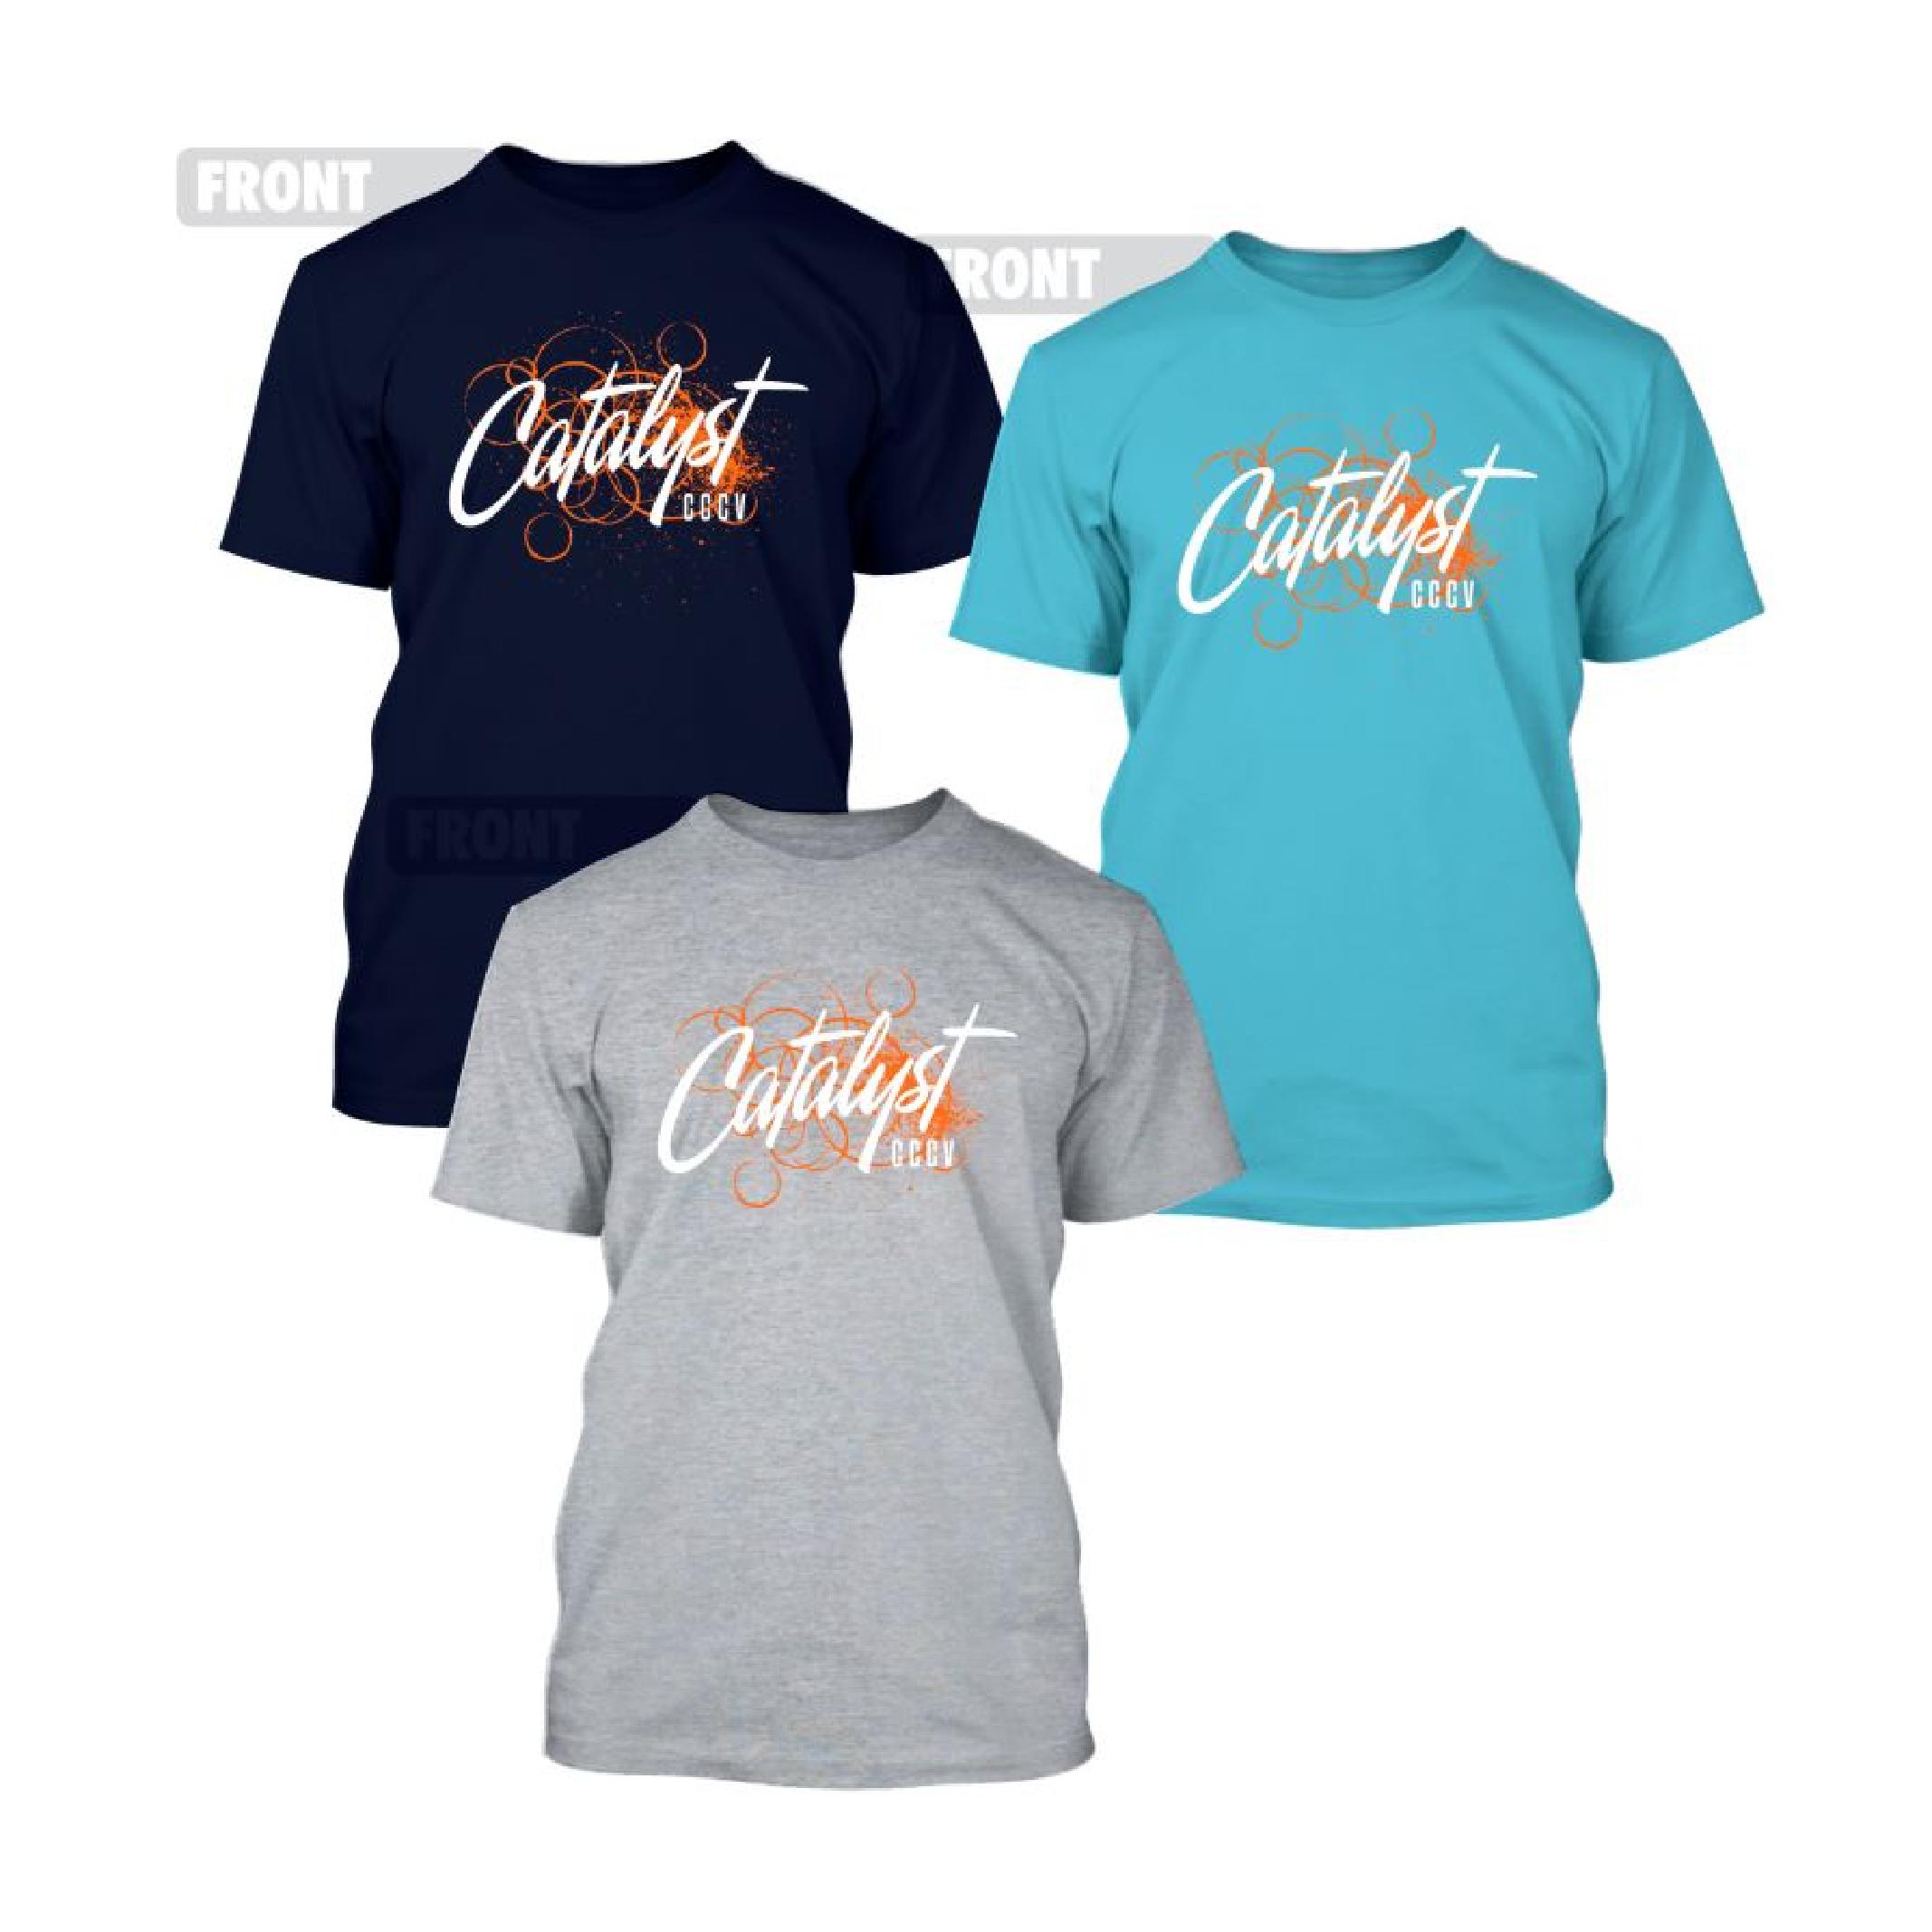 Pre-Order A Catalyst T-Shirt